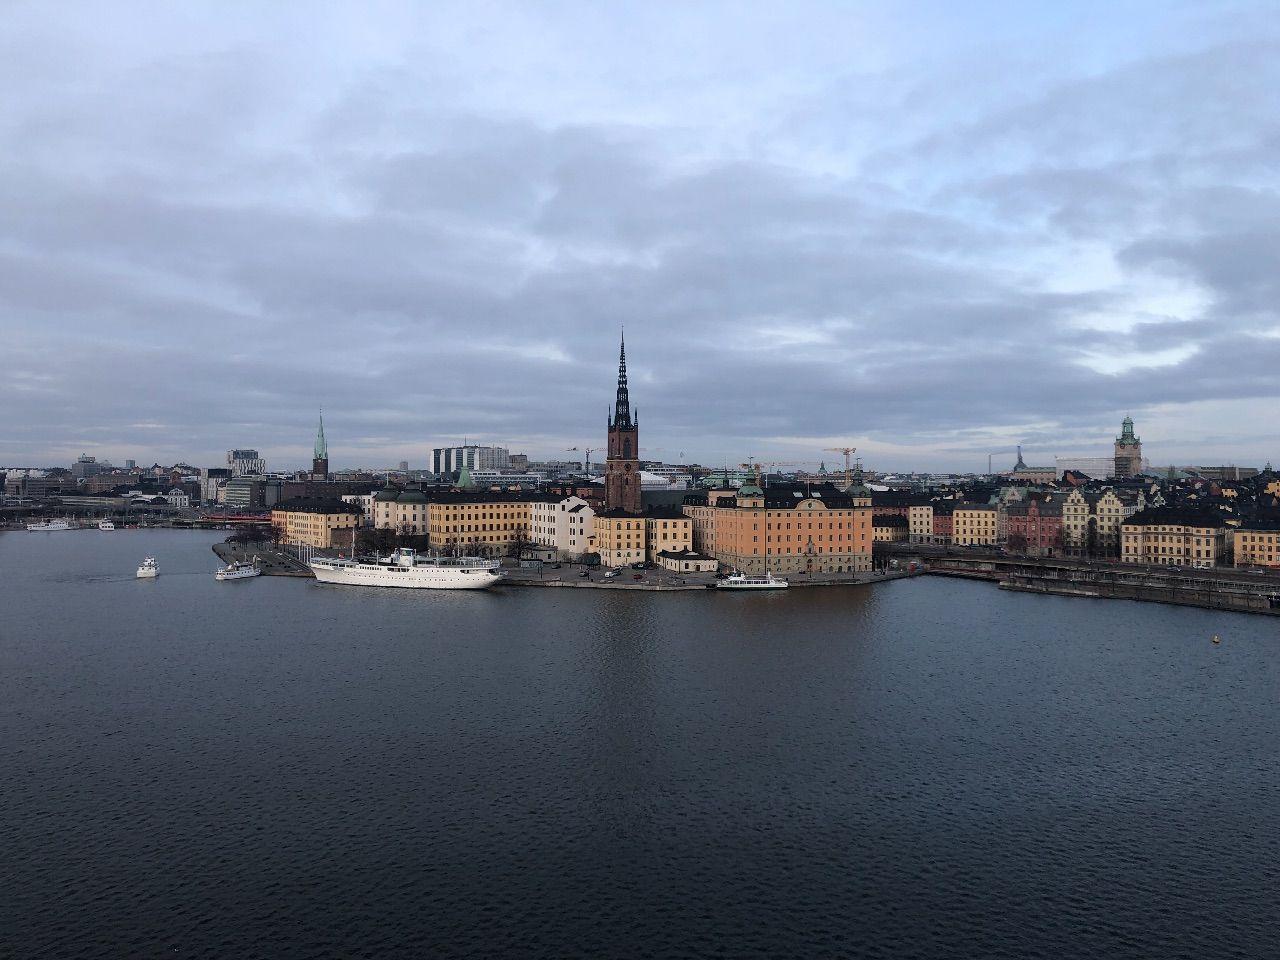 Stockholms stadshus januari 2021.